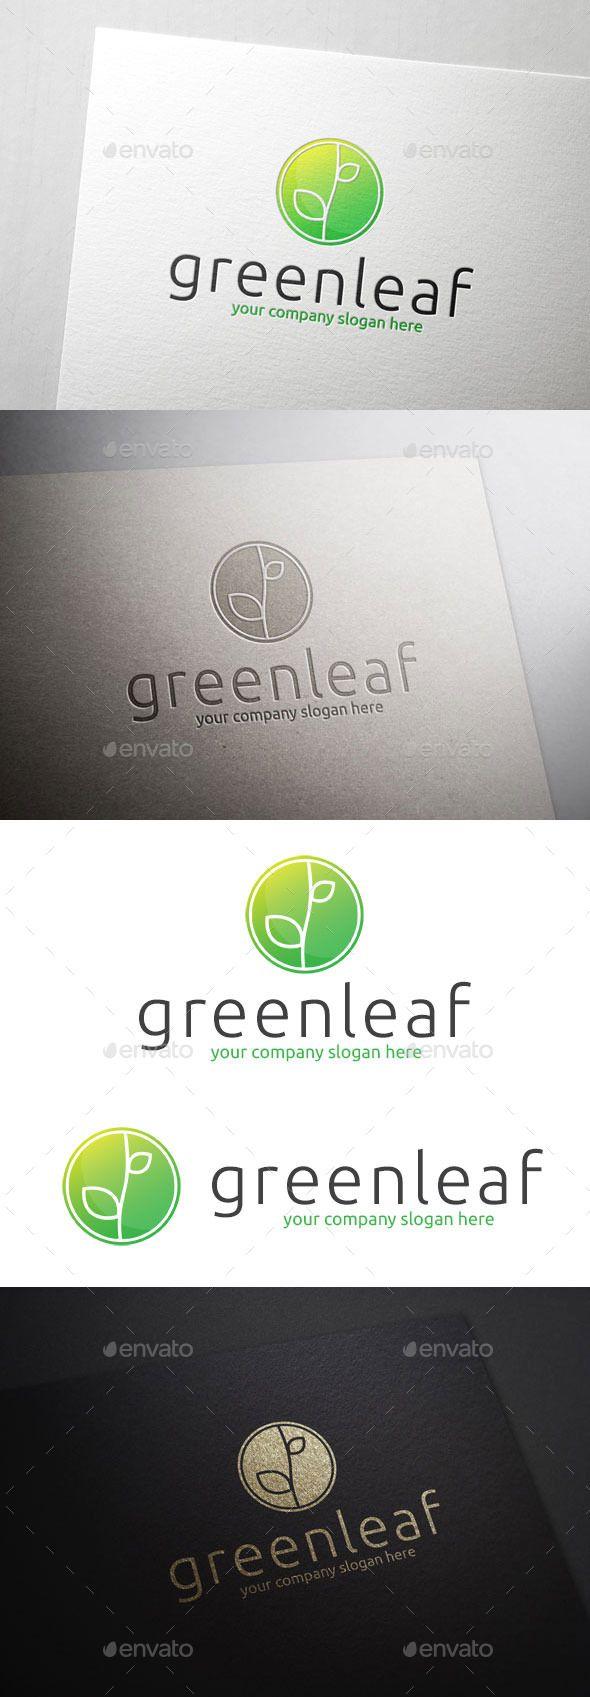 Green Leaf - Logo Design Template Vector #logotype Download it here: http://graphicriver.net/item/green-leaf-logo/10823234?s_rank=1102?ref=nesto